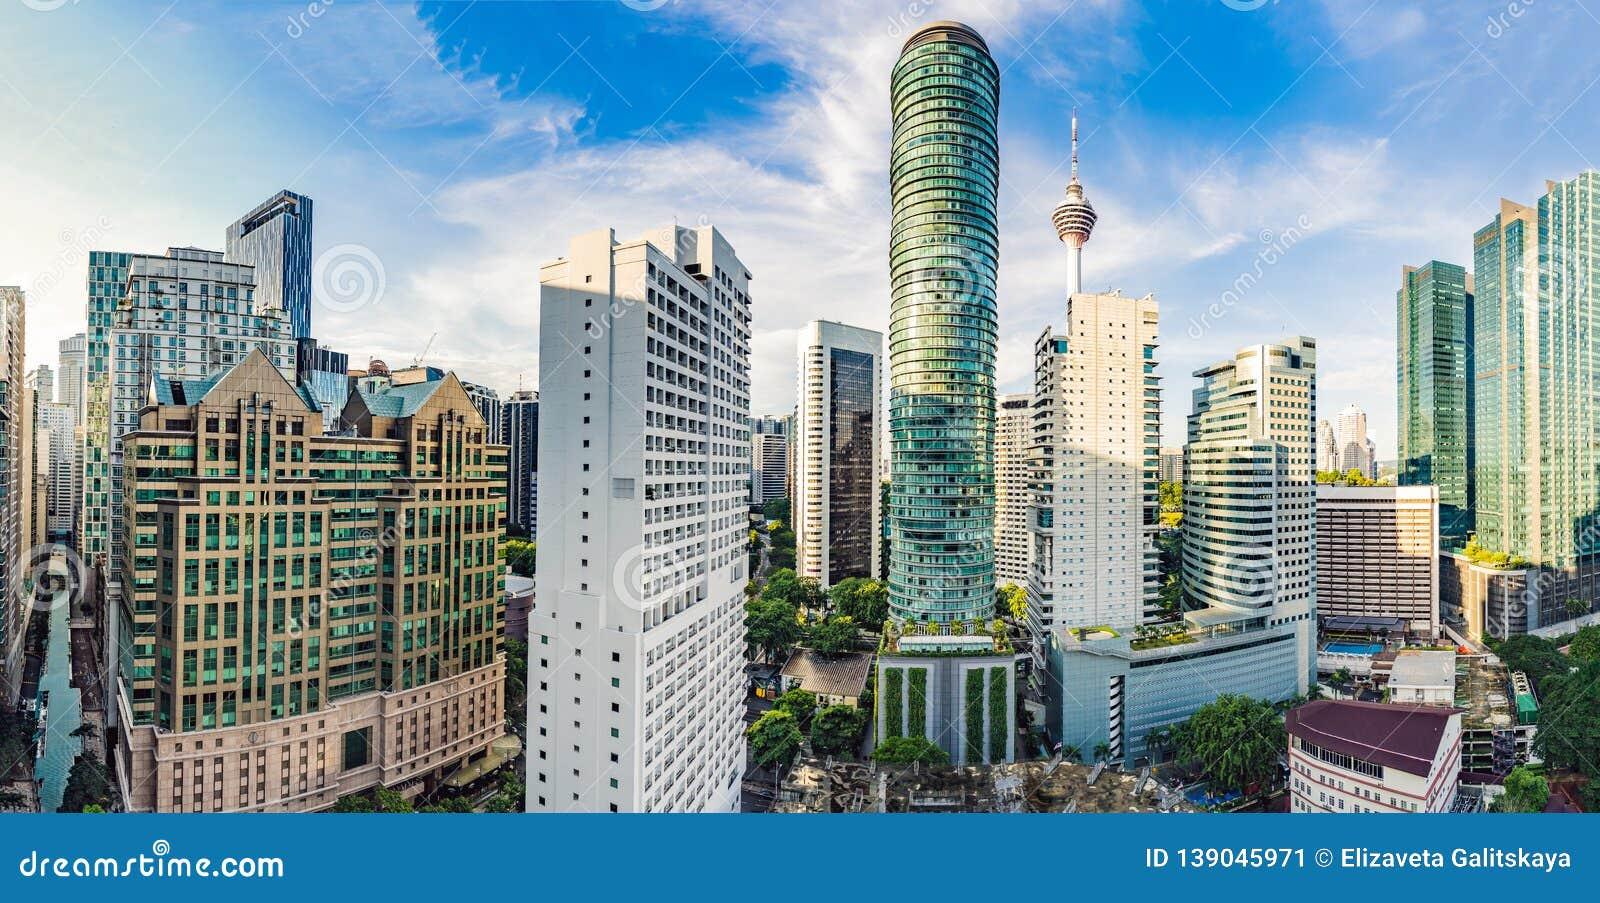 Skyscrapers in Kuala Lumpur, Malaysia City Center skyline